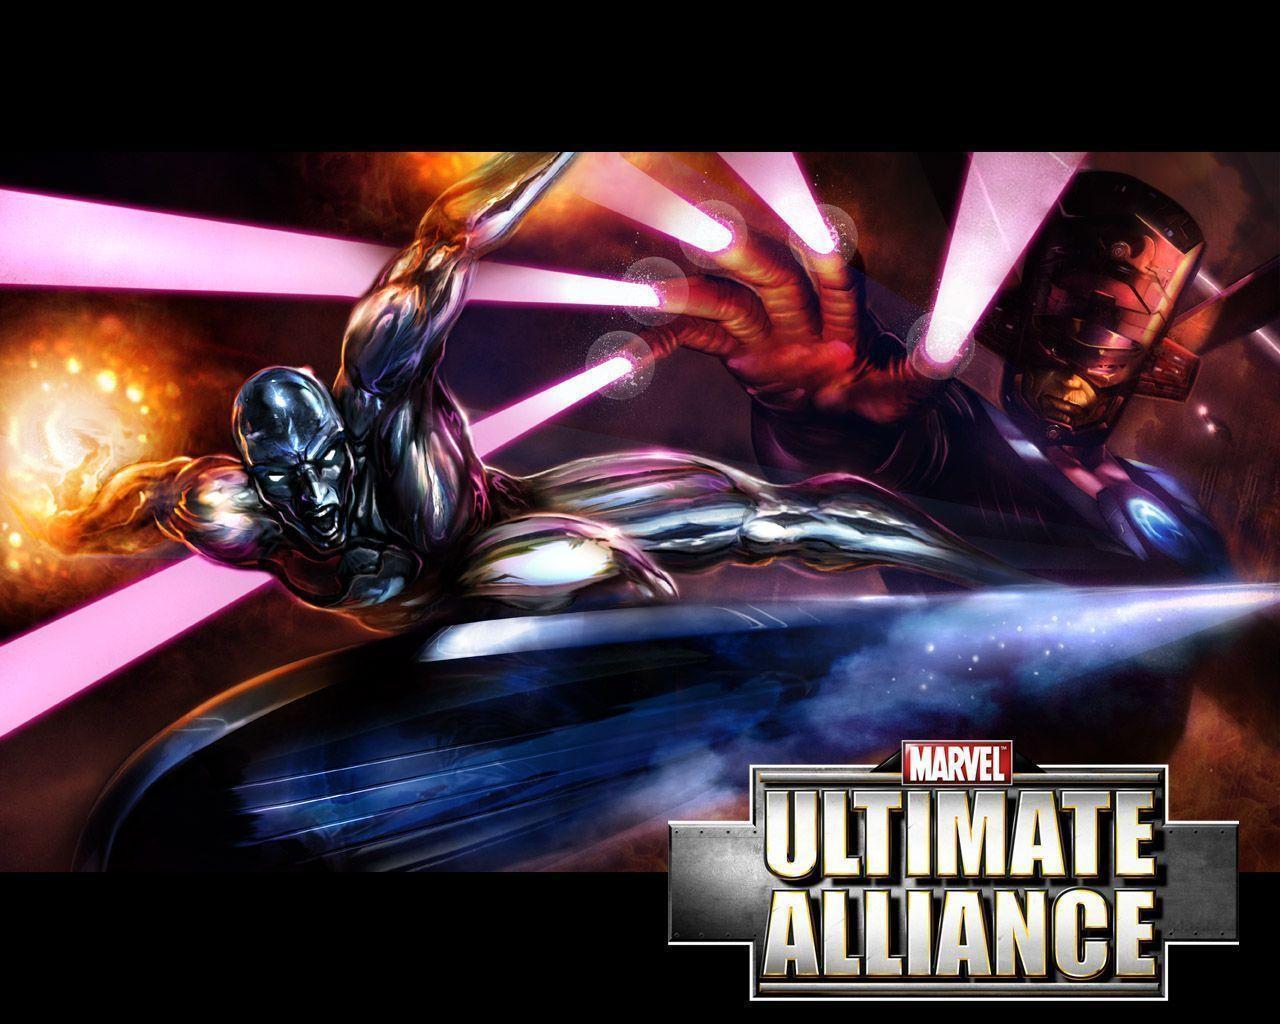 Super Cars Wallpaper Cave Marvel Ultimate Alliance 2 Wallpapers Wallpaper Cave